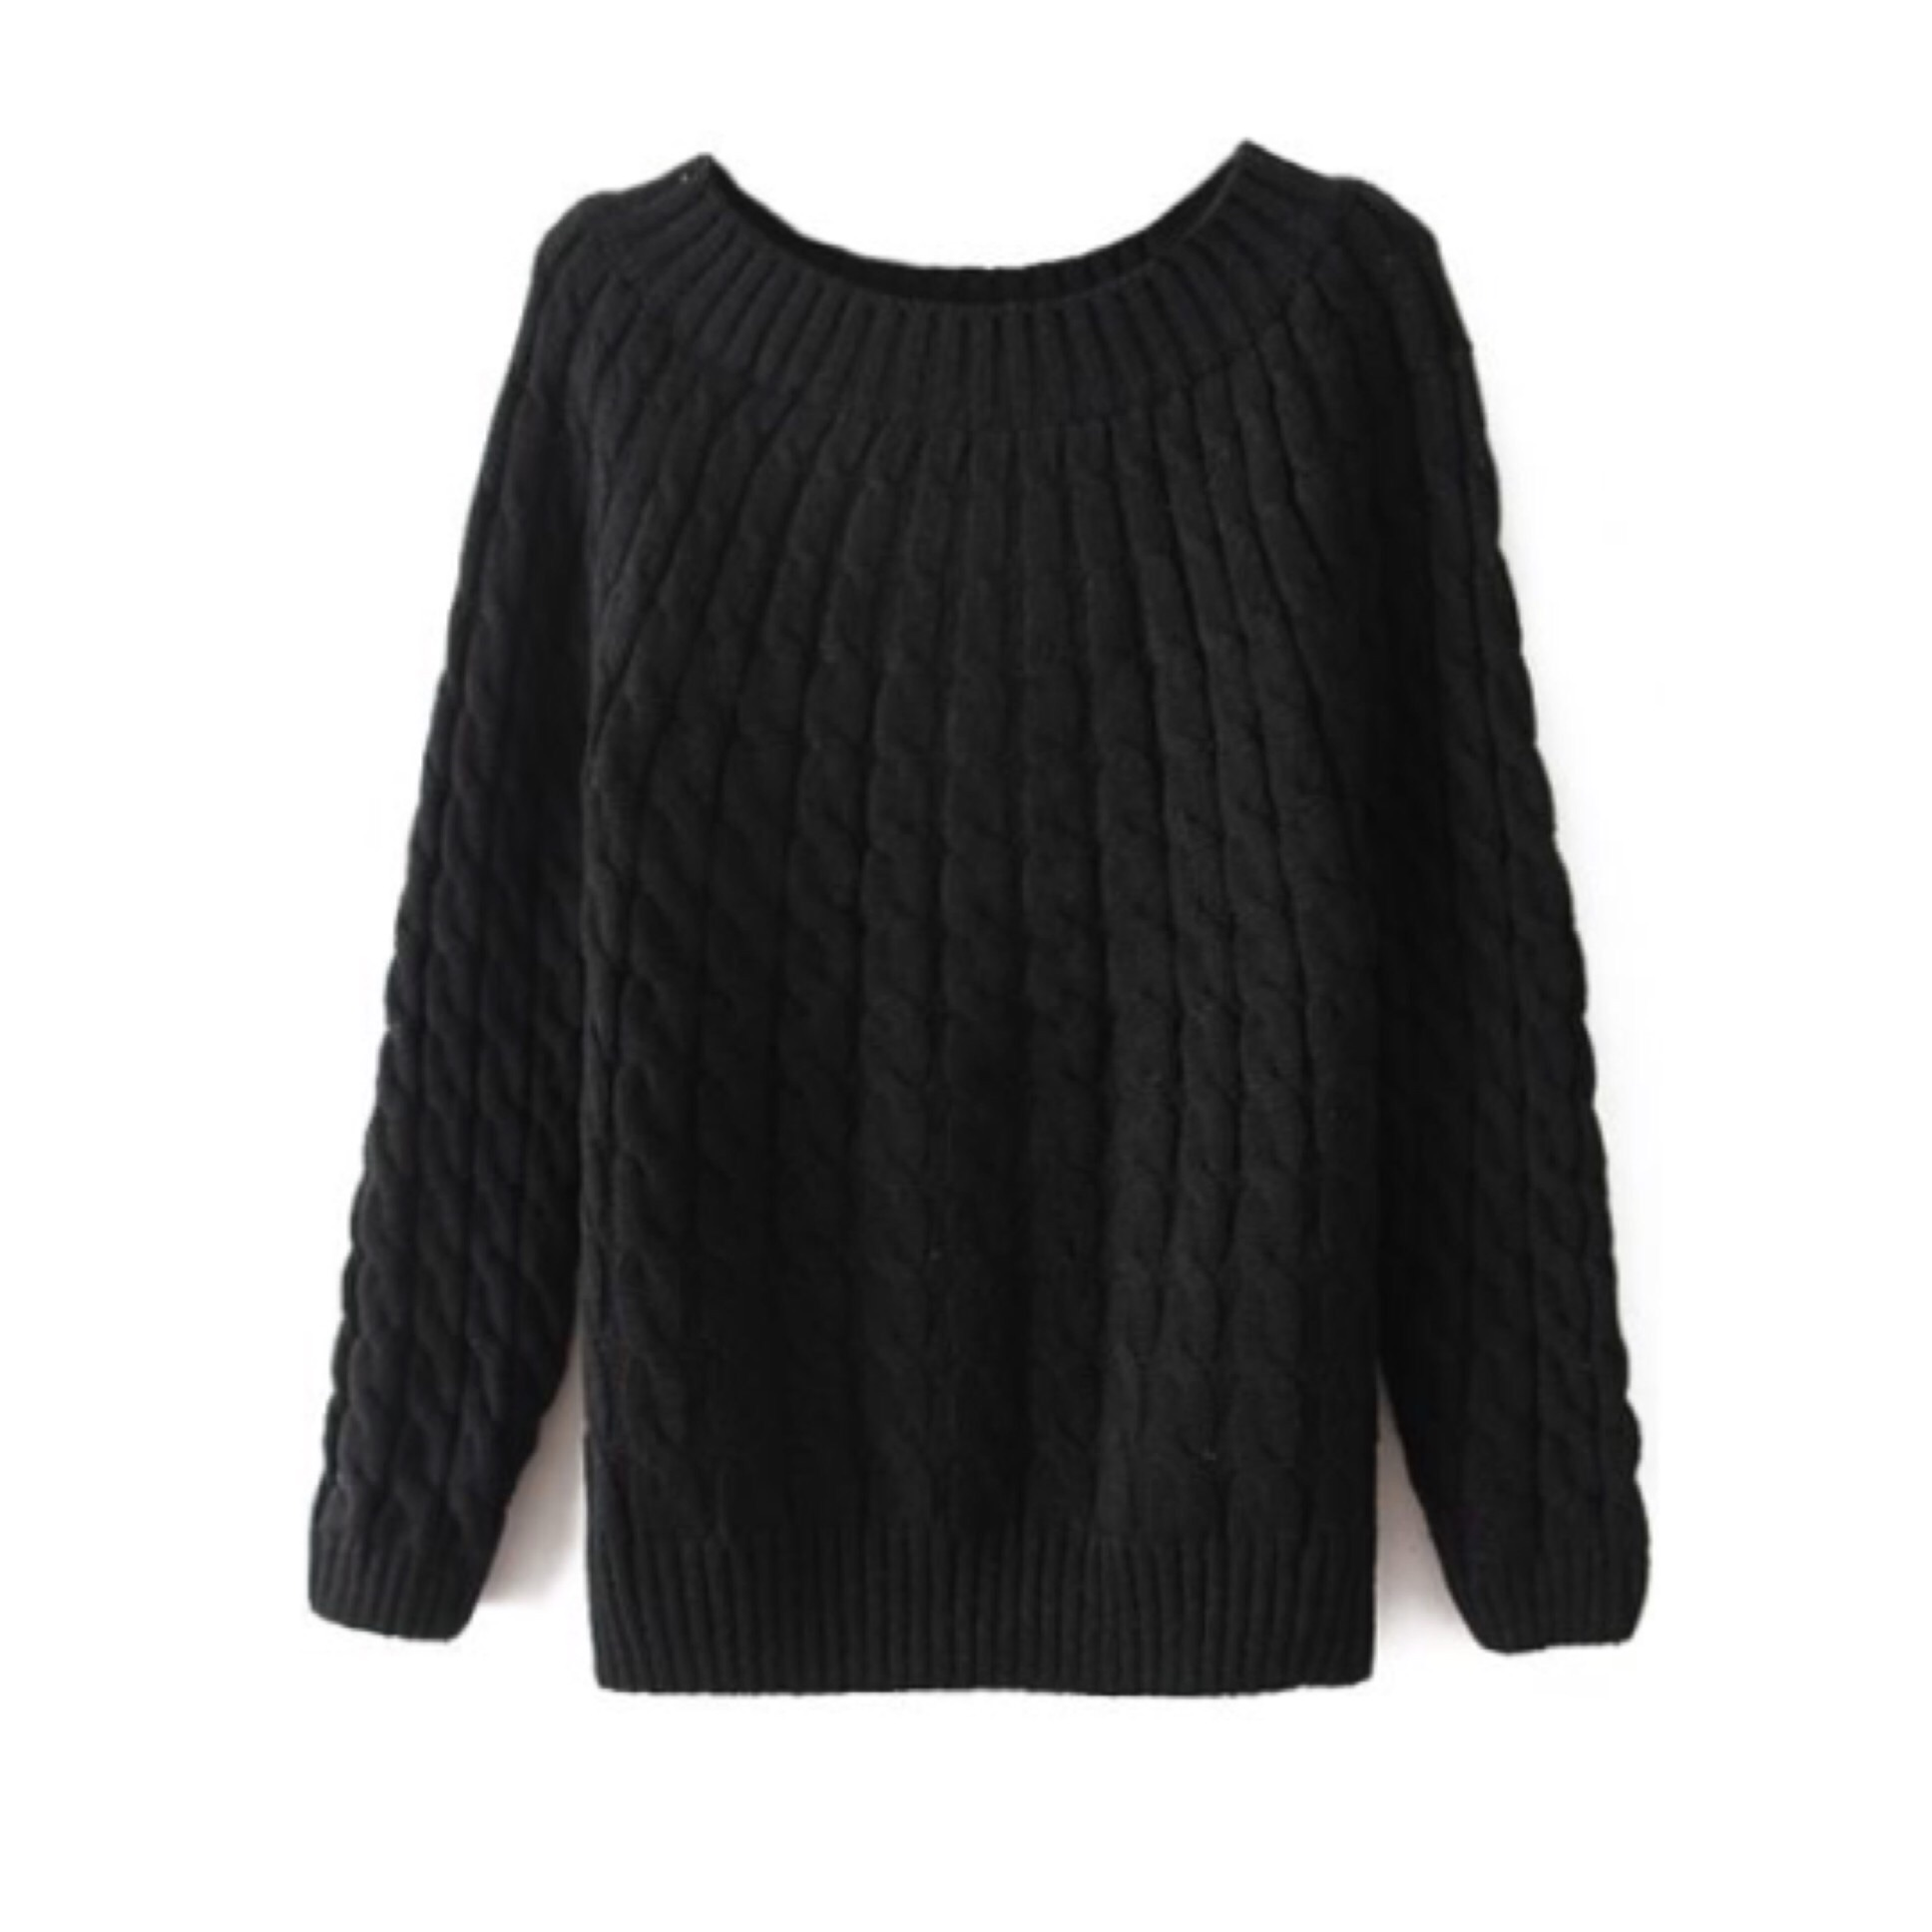 Cozy knit sweater from doublelw on storenvy